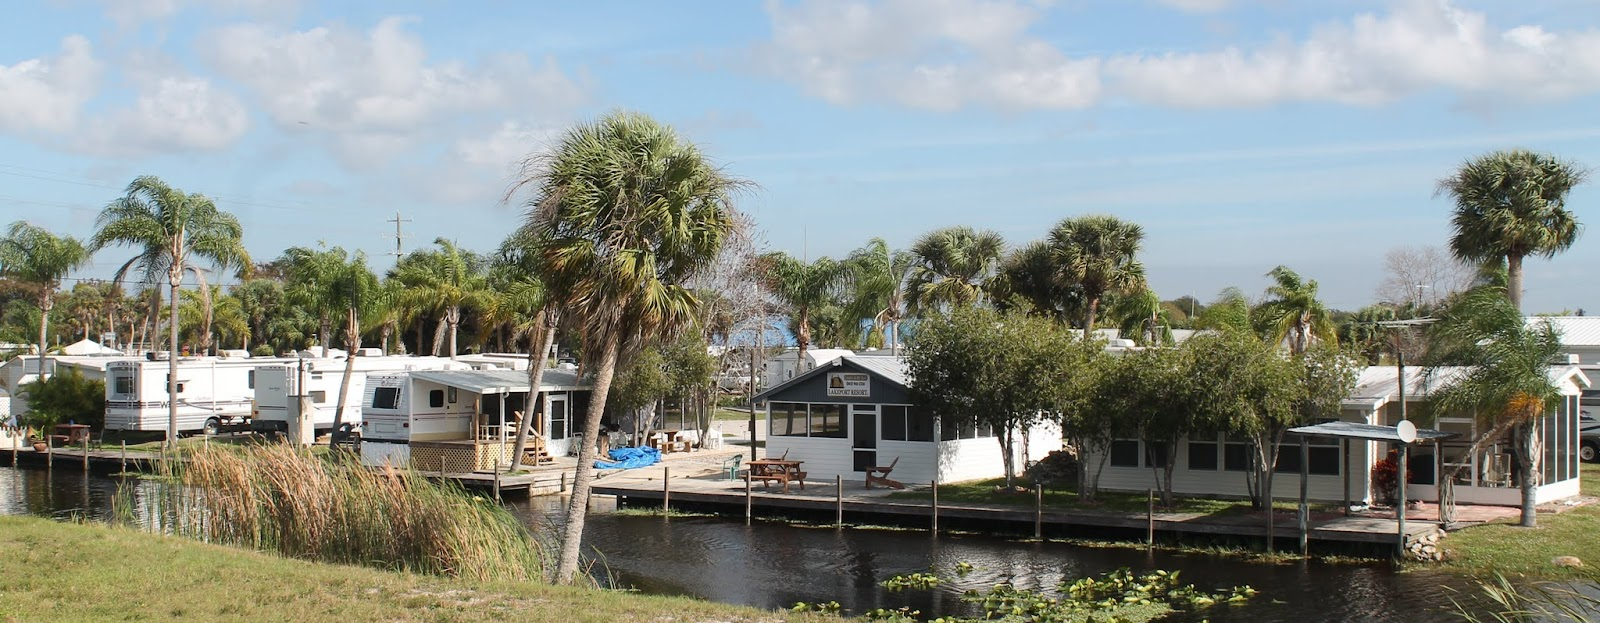 Lakeport Resort desde el Herbert Hoover Dike